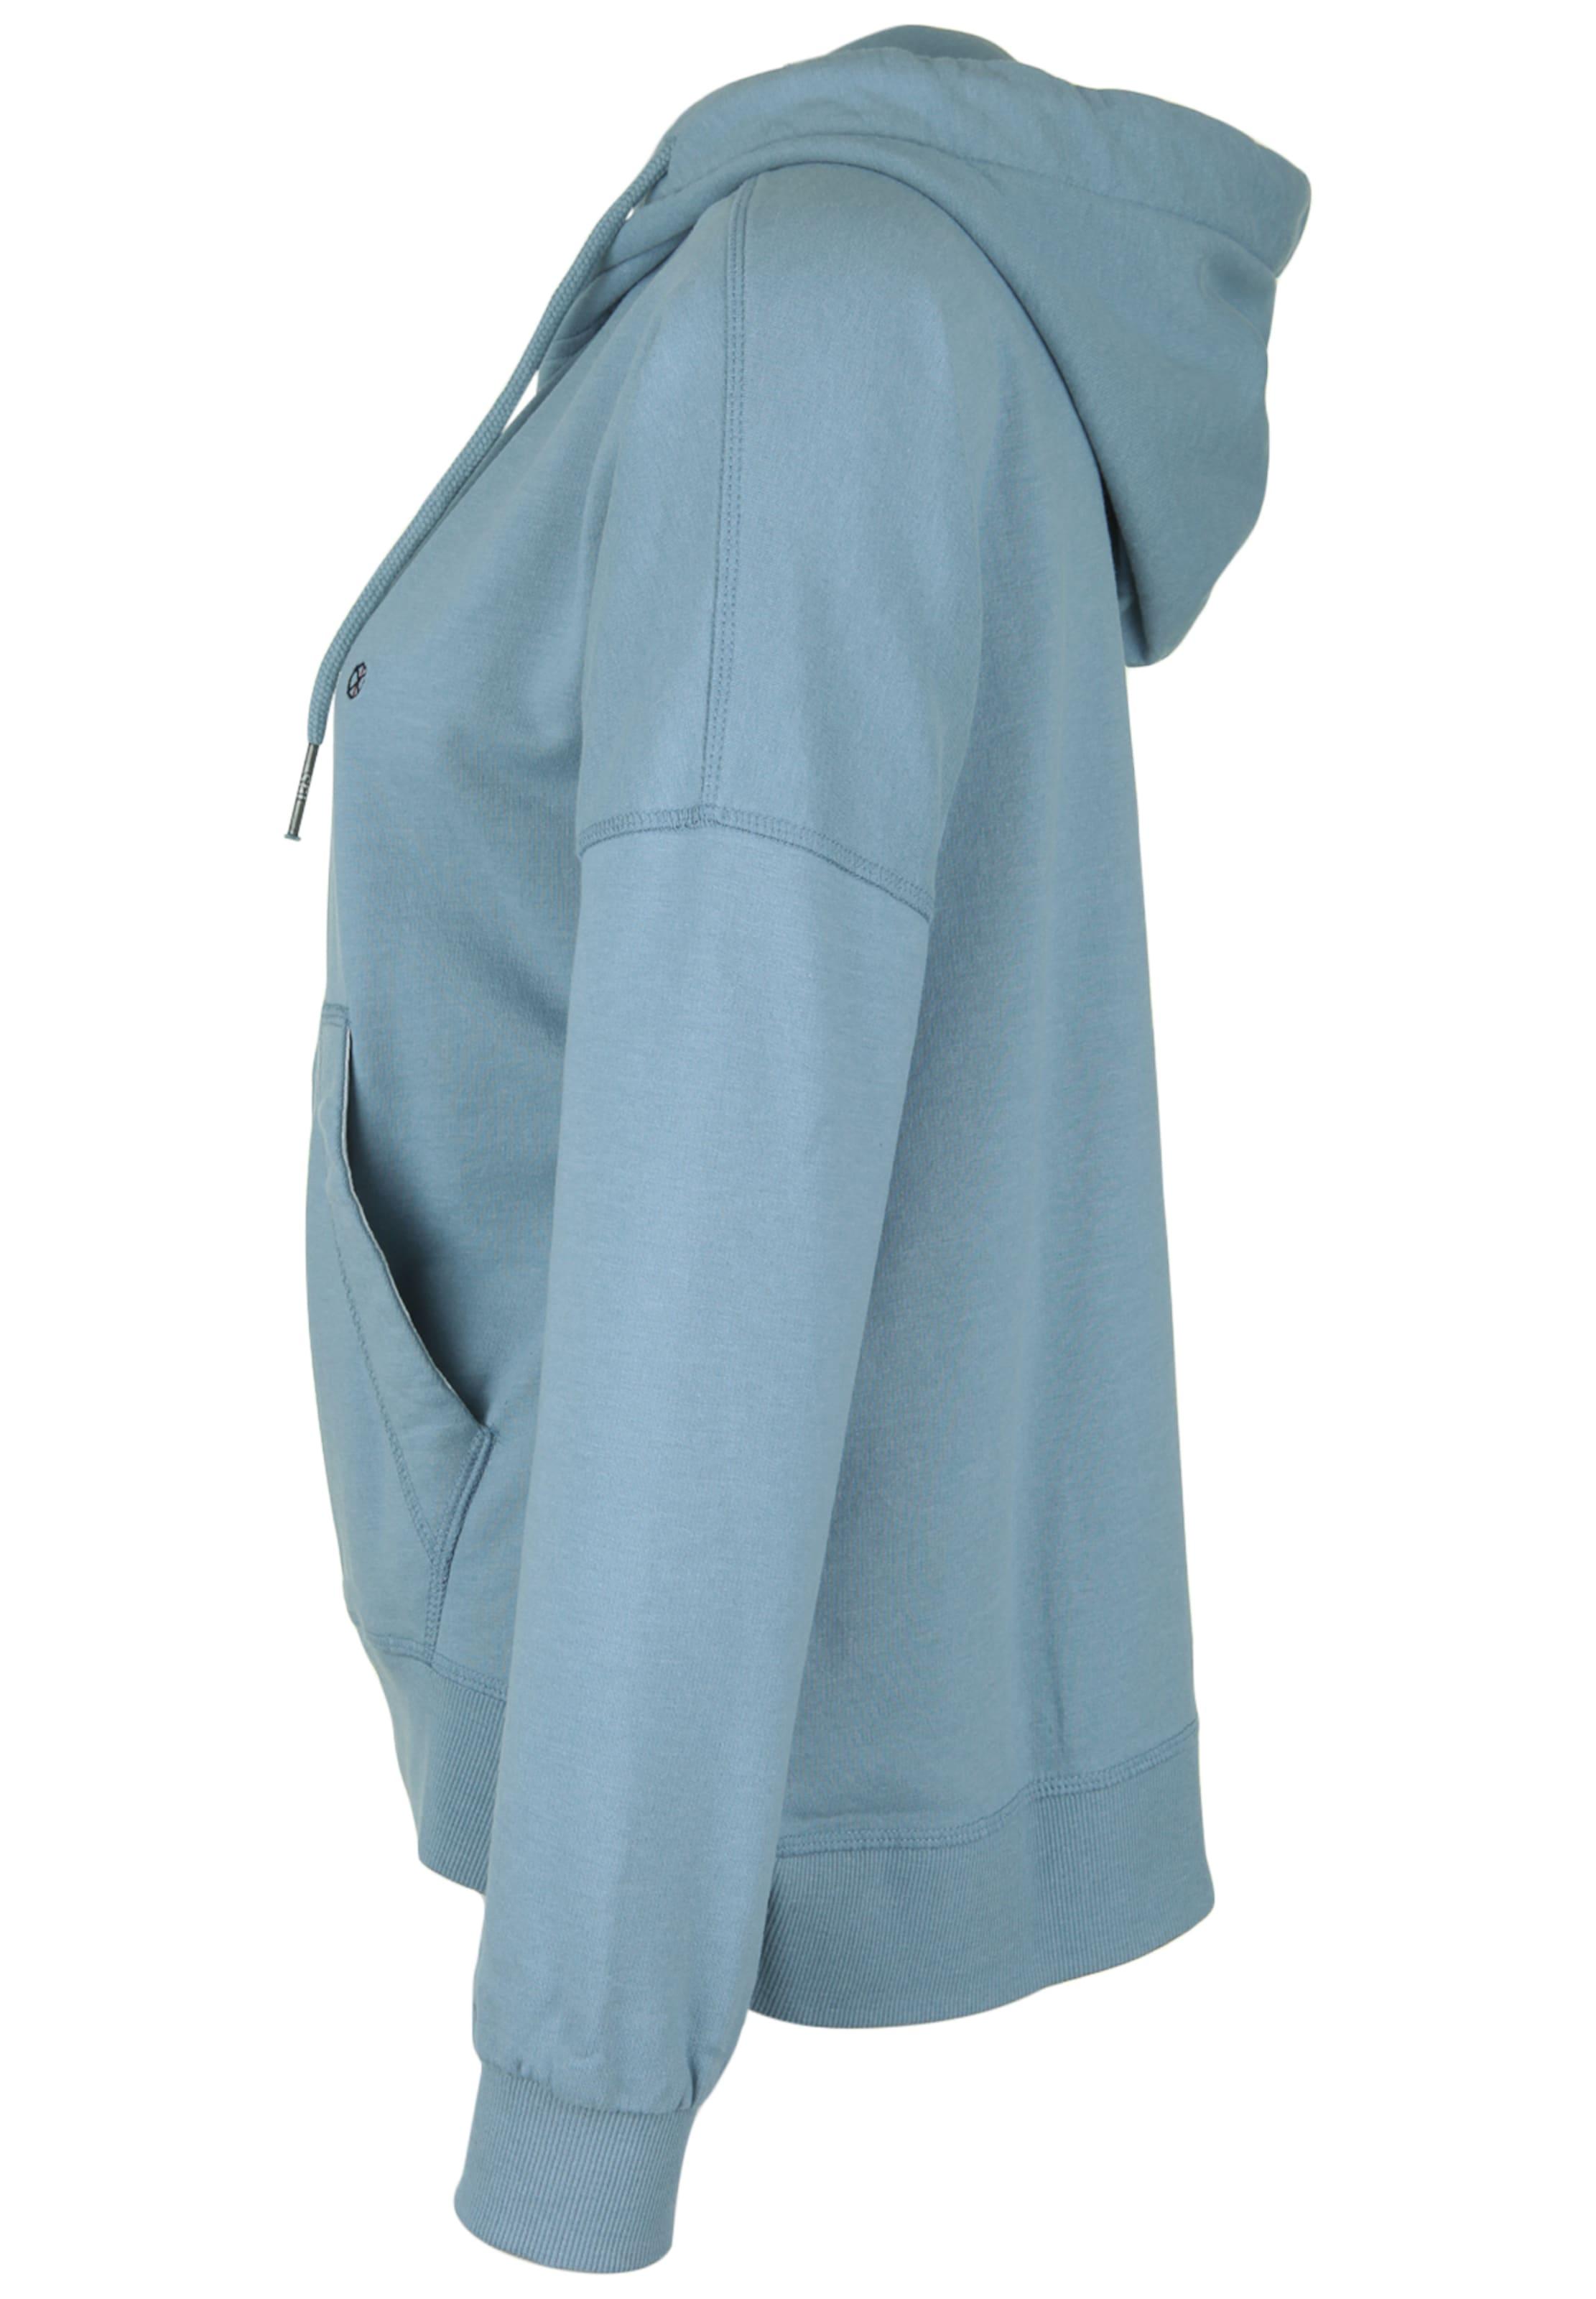 For 'phillina' Life Hellblau BlauRauchblau Shirts In Kapuzensweatjacke 8kXP0NnwOZ